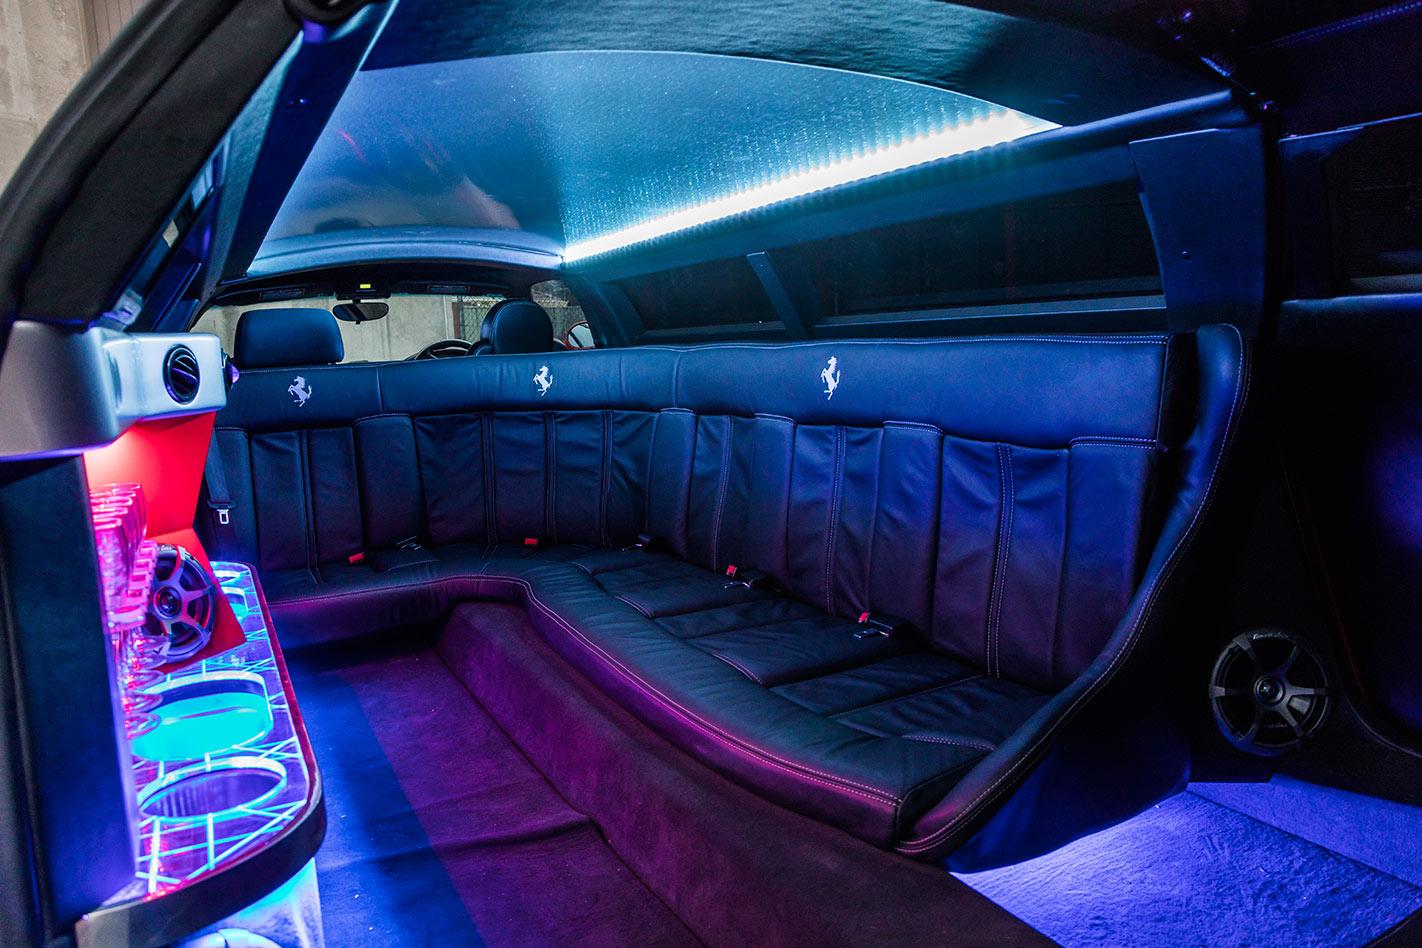 Stretch Ferrari limo interior